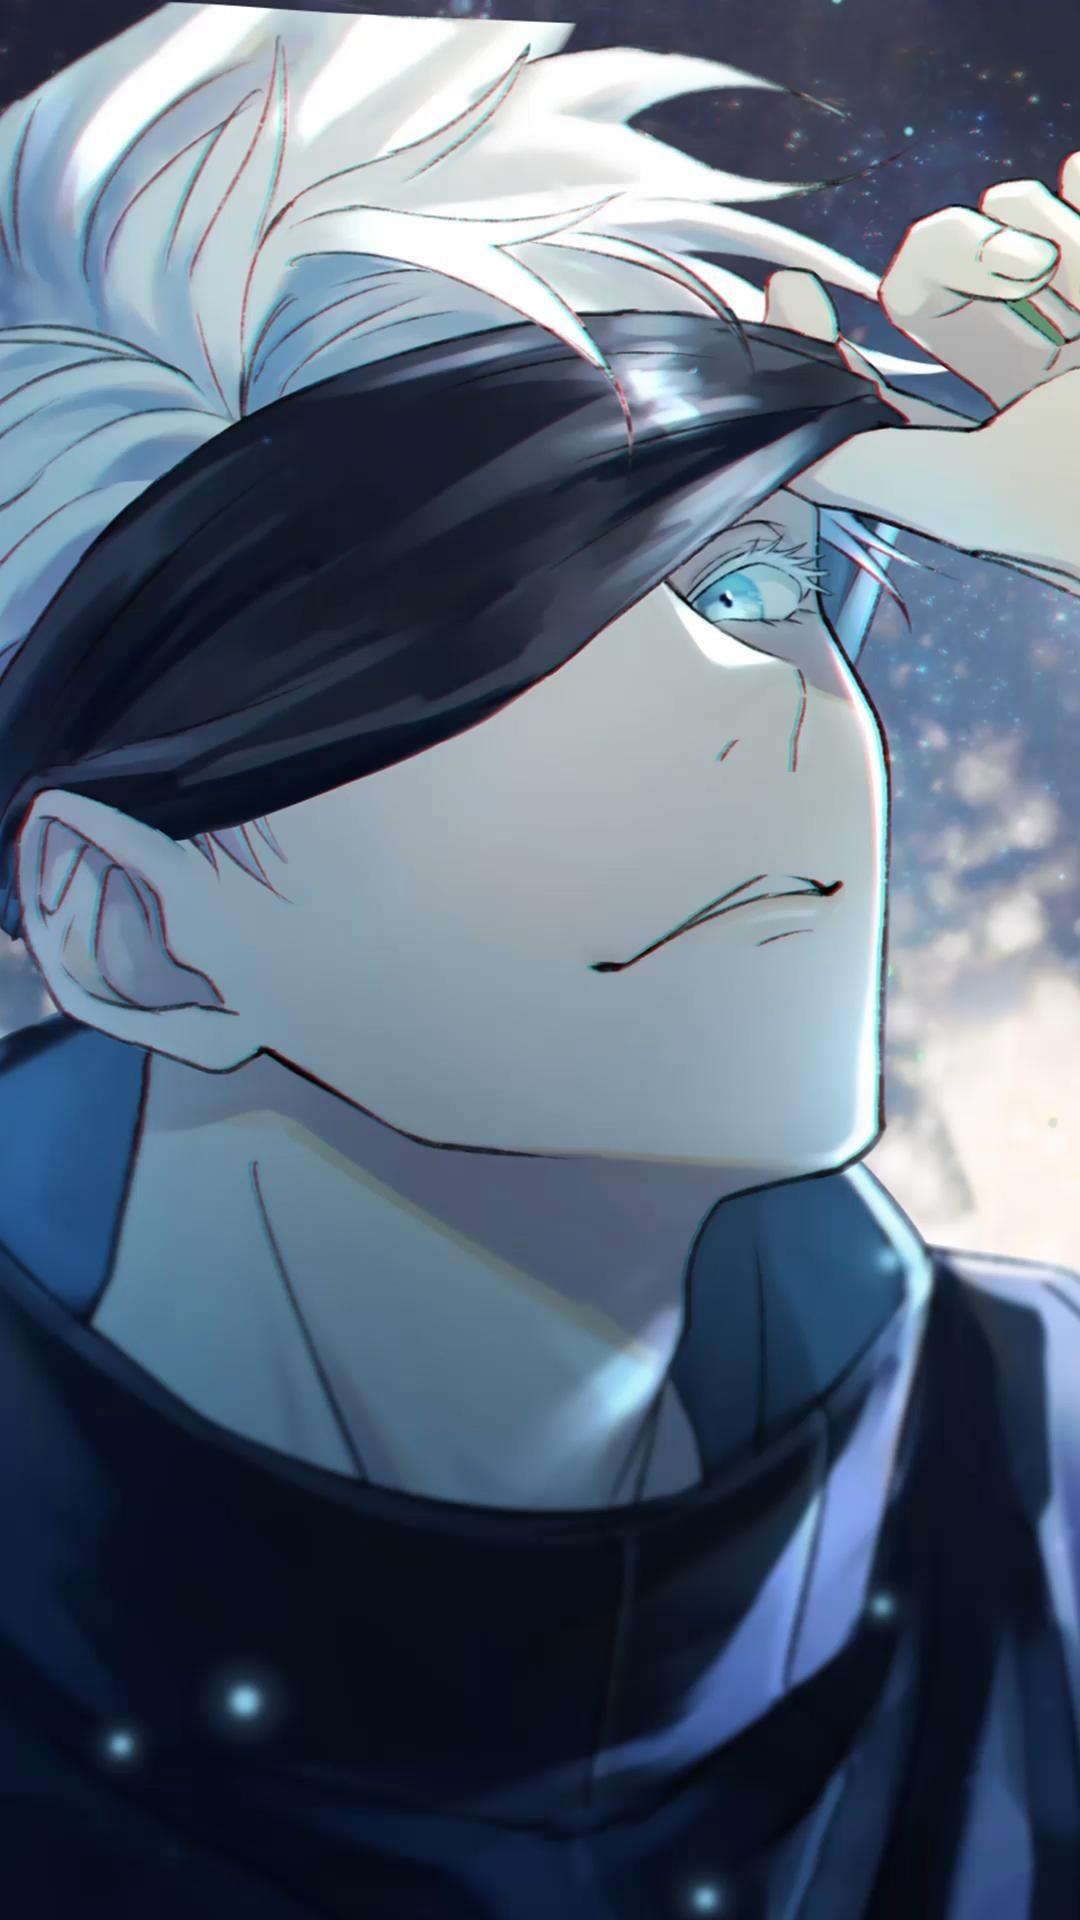 Jujutsu Kaisen Gojo Satoru Live Wallpaper Video Em 2021 Fantasia Anime Wallpaper Animes Personagens De Anime